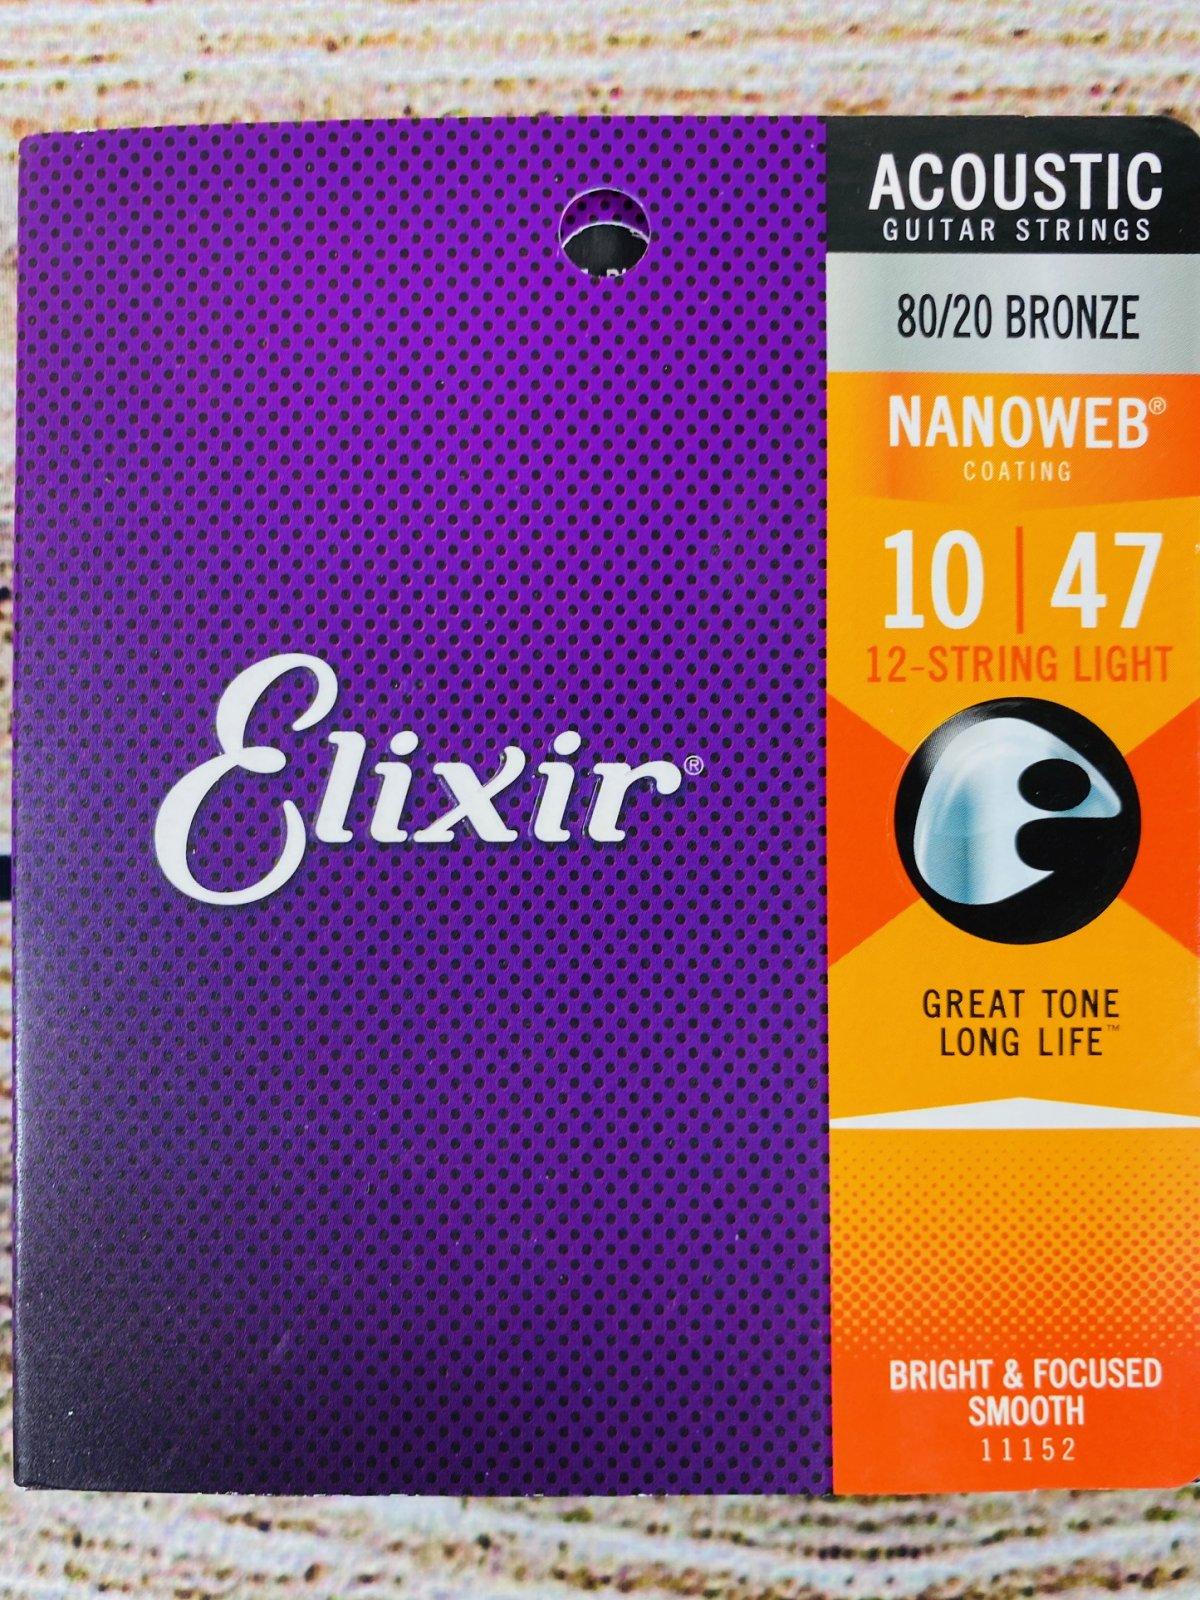 Elixir Strings Nanoweb 80/20 Acoustic Guitar Strings - .010-.047 Light 12-String